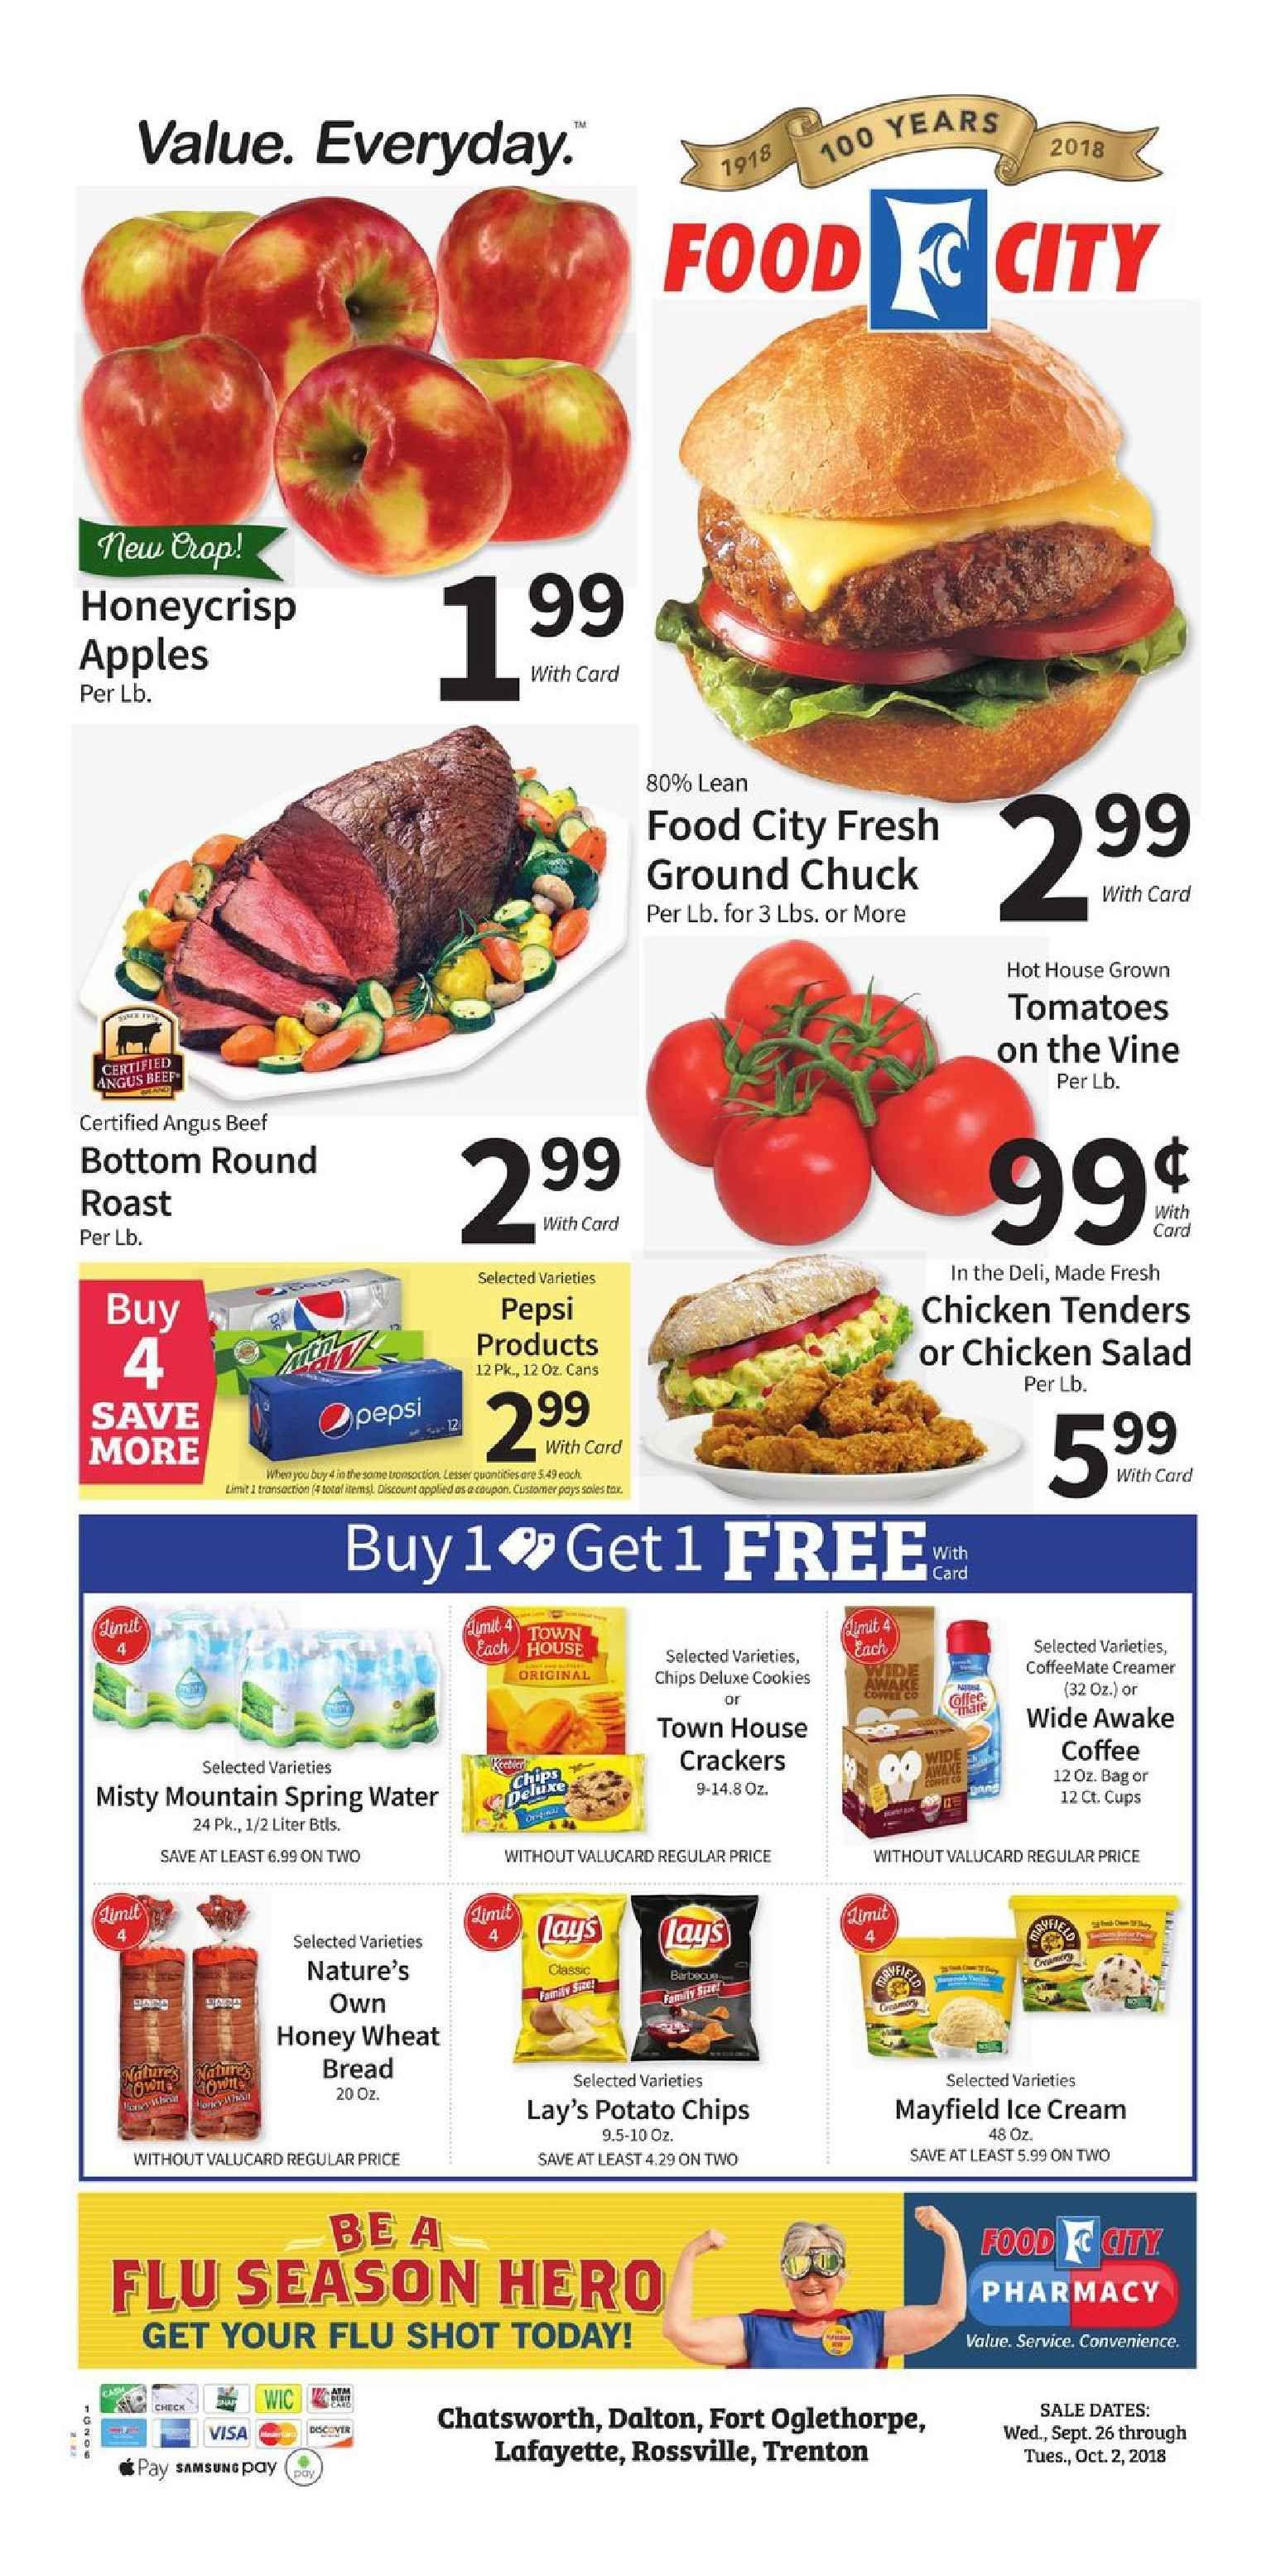 Food City Weekly Ad Flyer January 16 22 2019 Weekly Ad